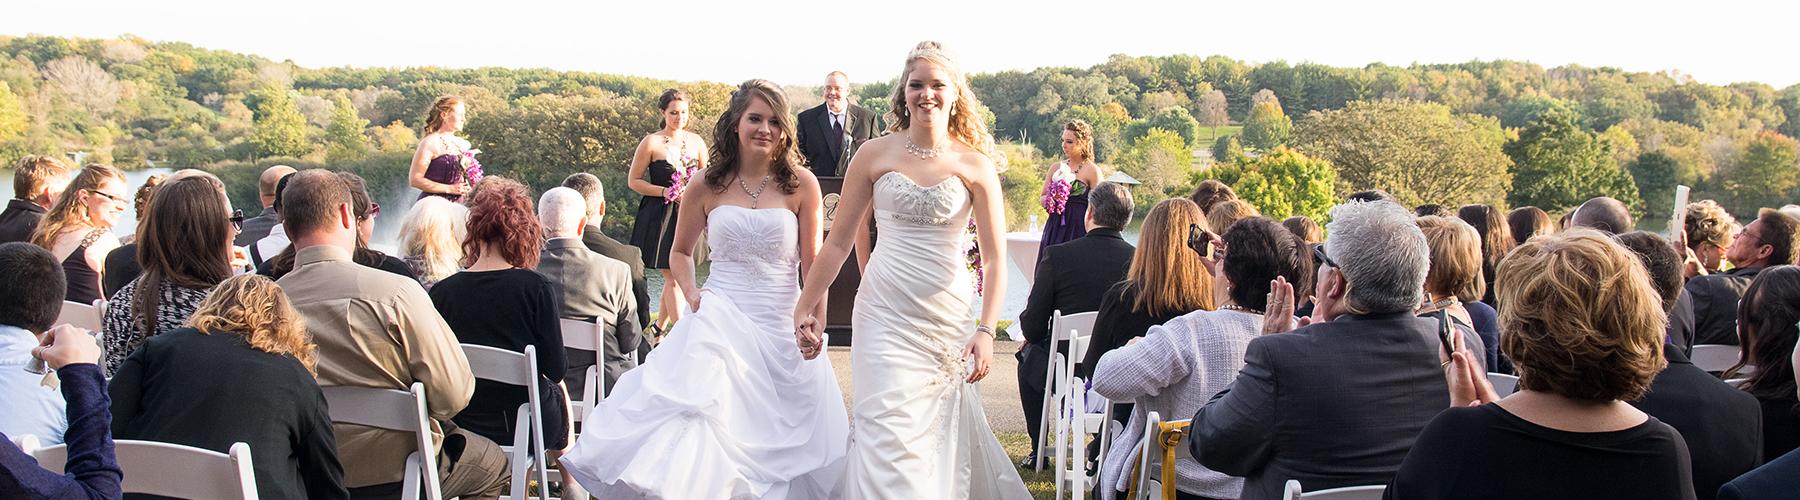 Lesbian Wedding At Grand Geneva Resort & Spa